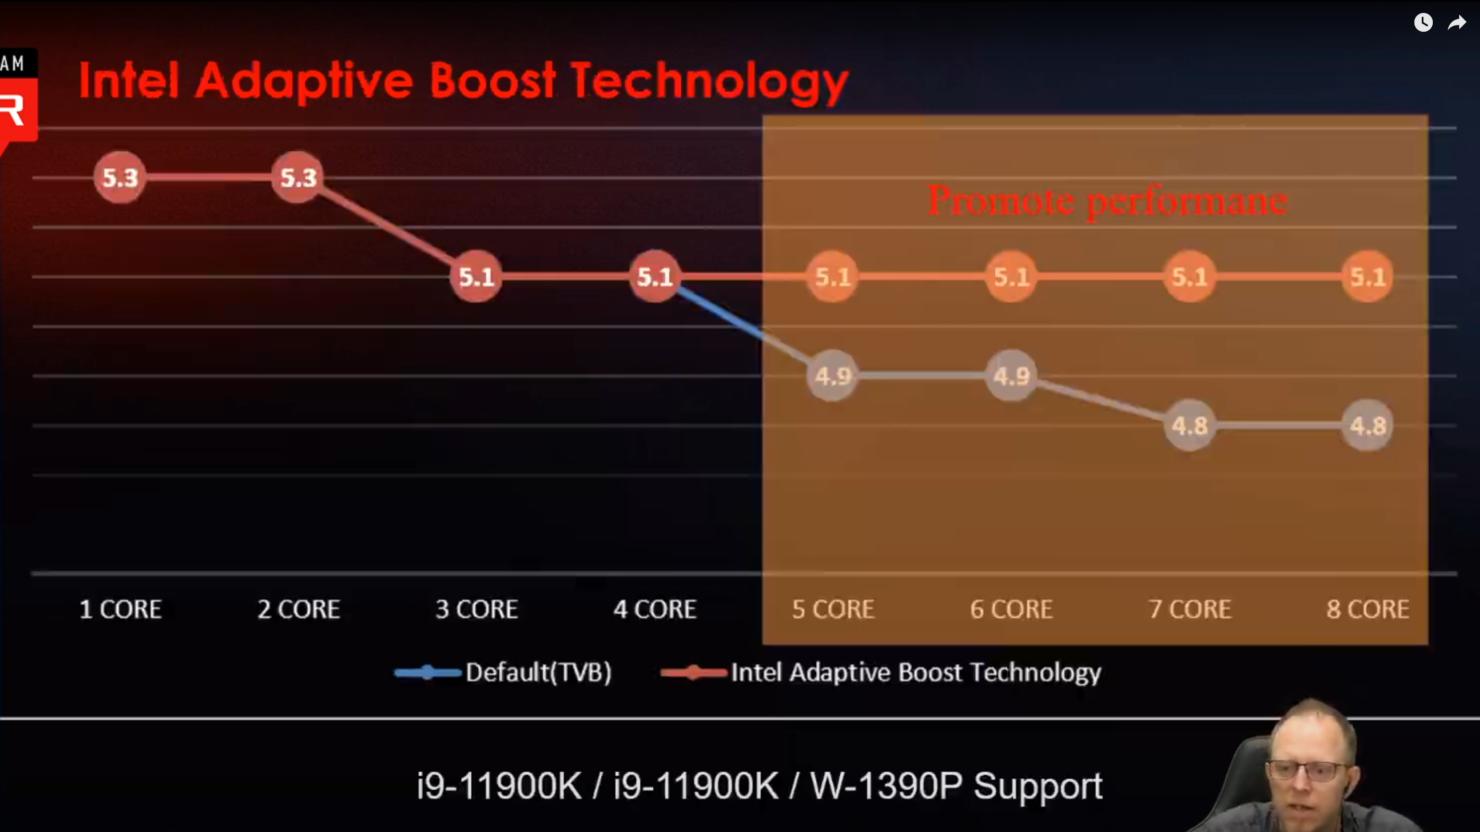 msi-intel-11th-gen-rocket-lake-desktop-cpu-overclocking-power-limits-temperatures-adaptive-boost-technology-gear-modes-detailed-_15